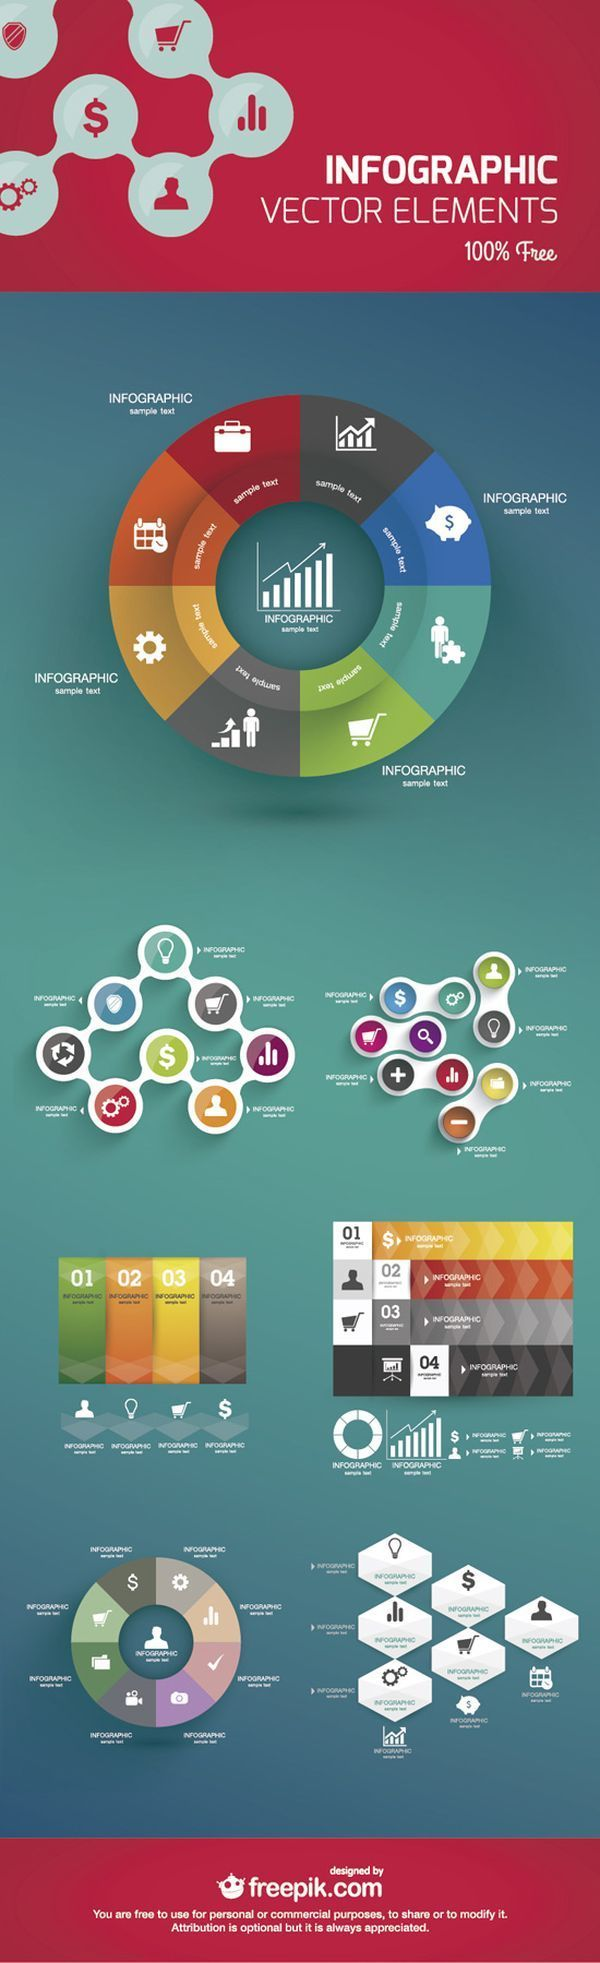 Pinterest infographic video